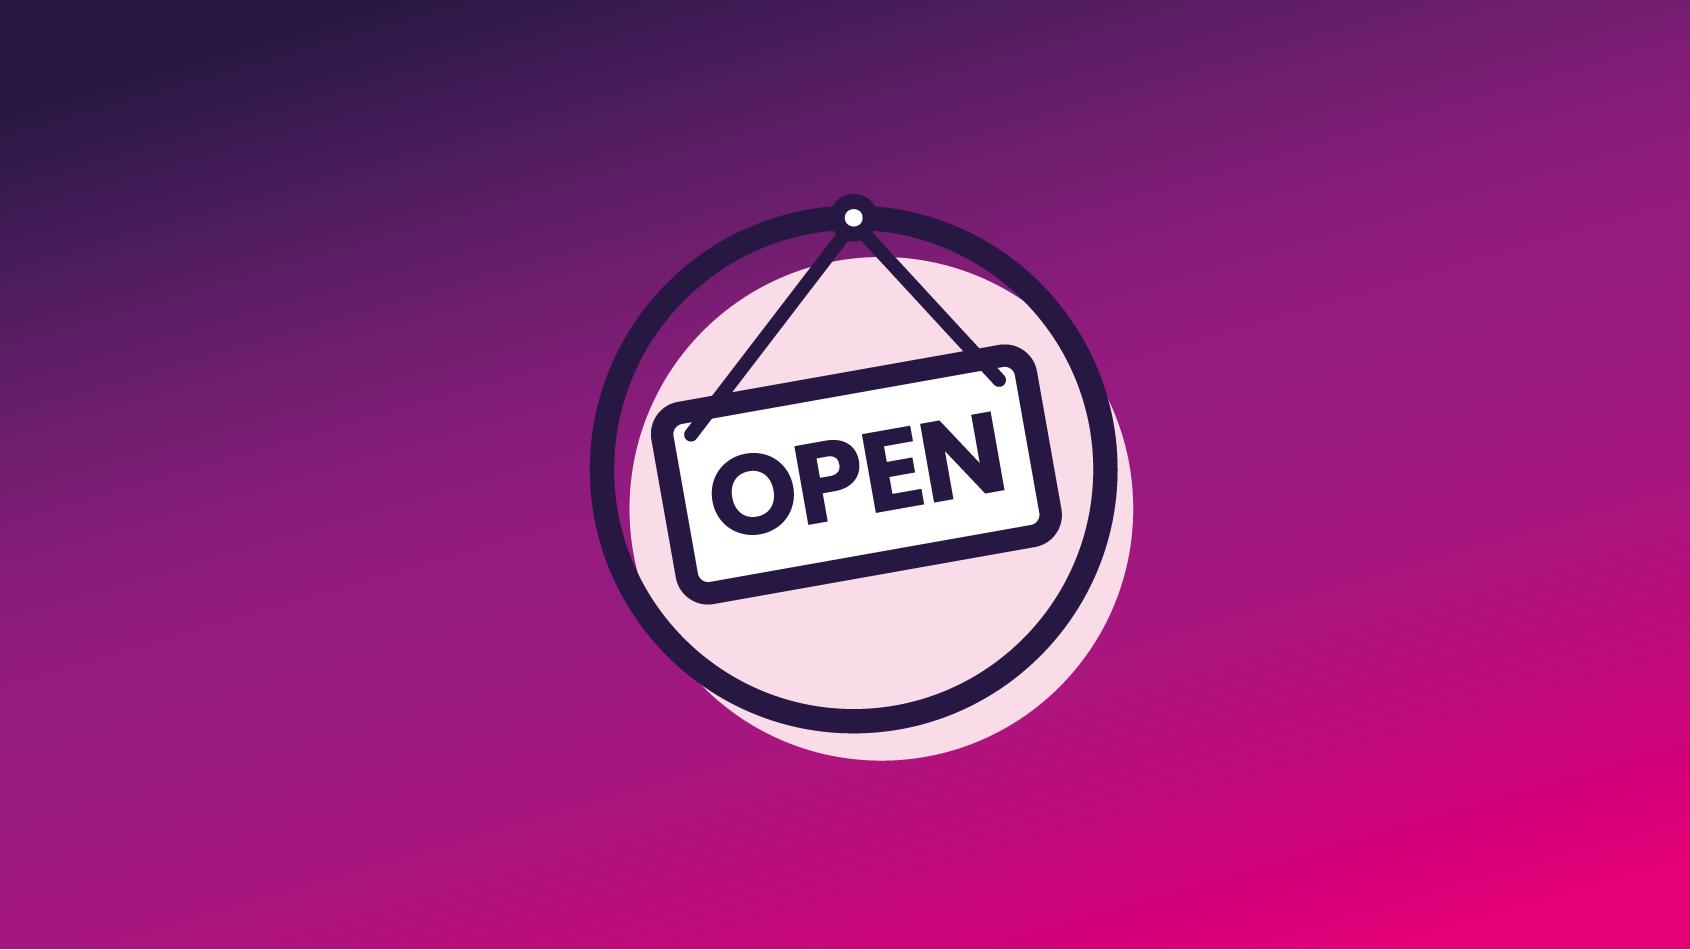 E-Fiber Open glasvezelwinkel icoon